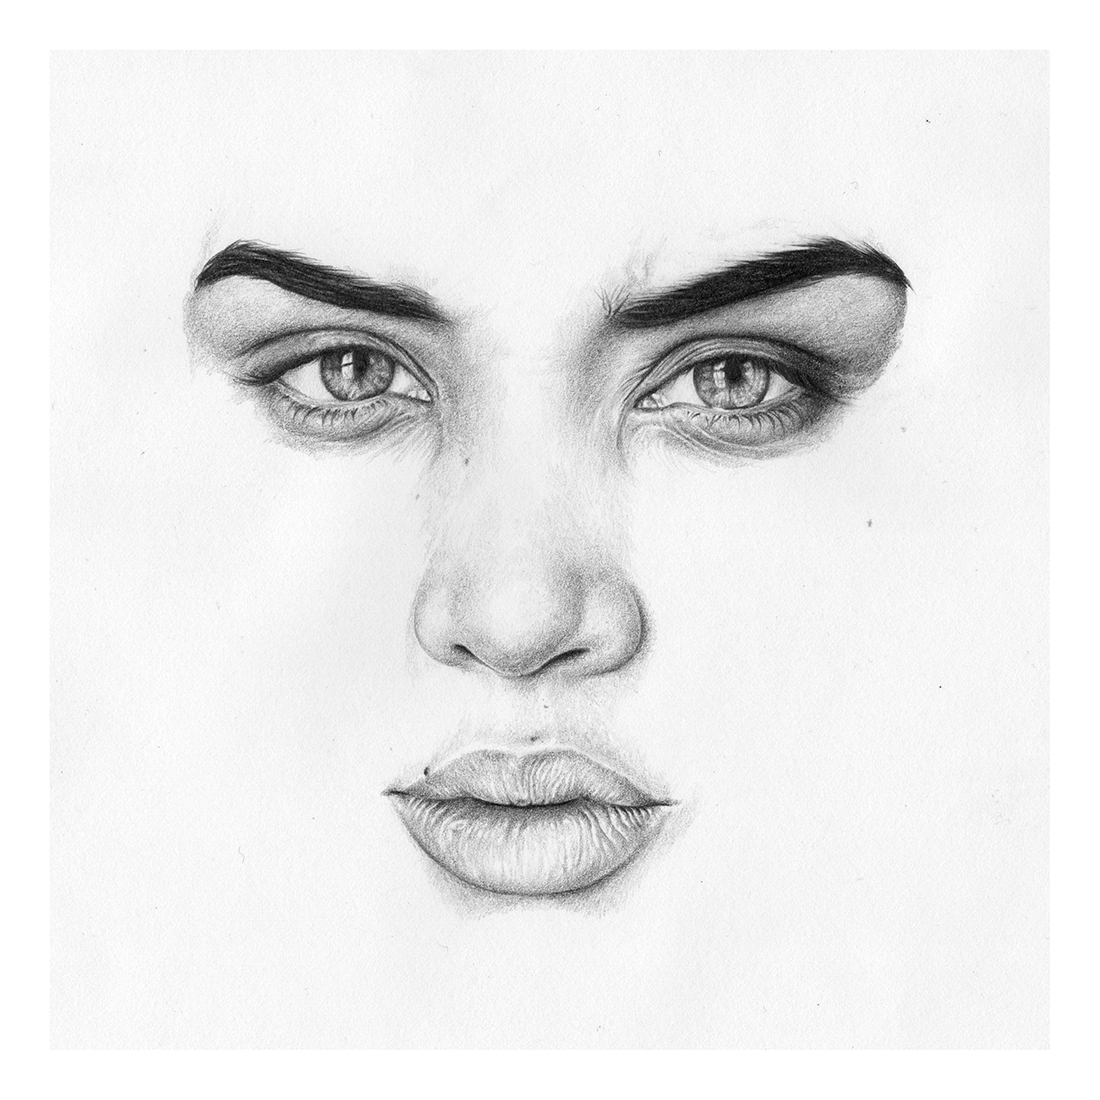 Drawn portrait minimalistic Drawings of Abe Design Realistic